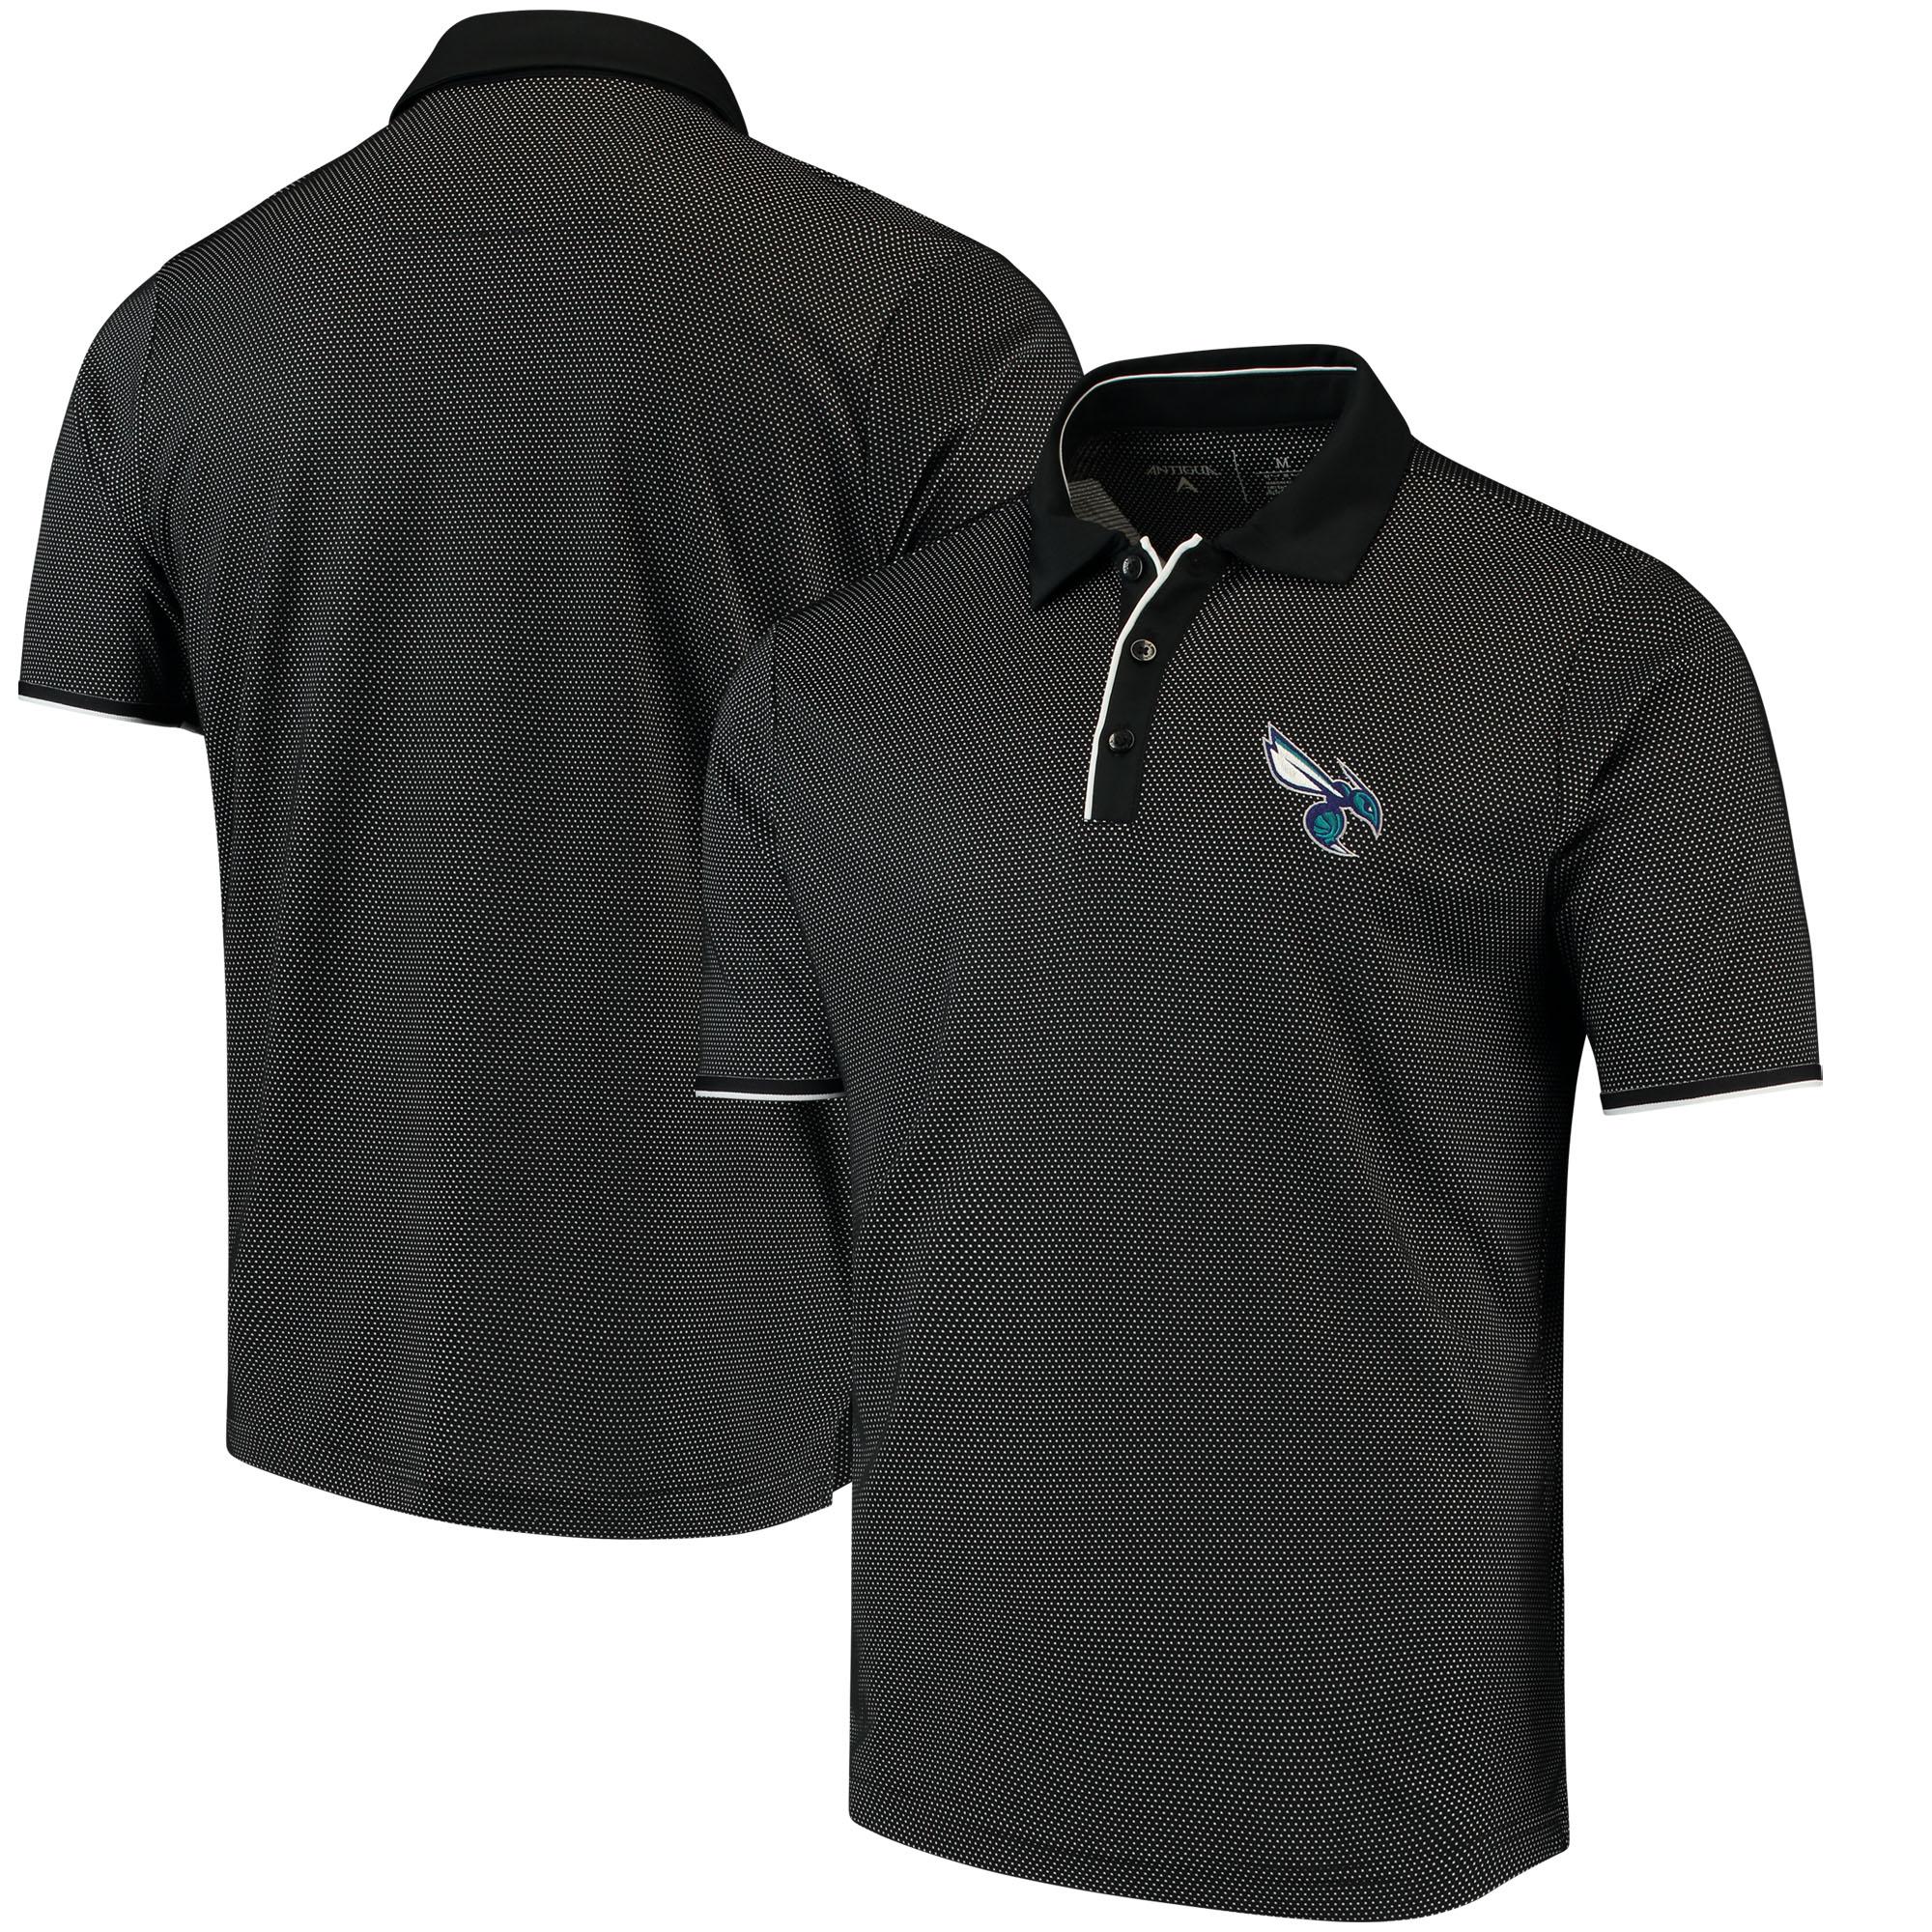 Charlotte Hornets Antigua Logo Draft Polo - Black/White